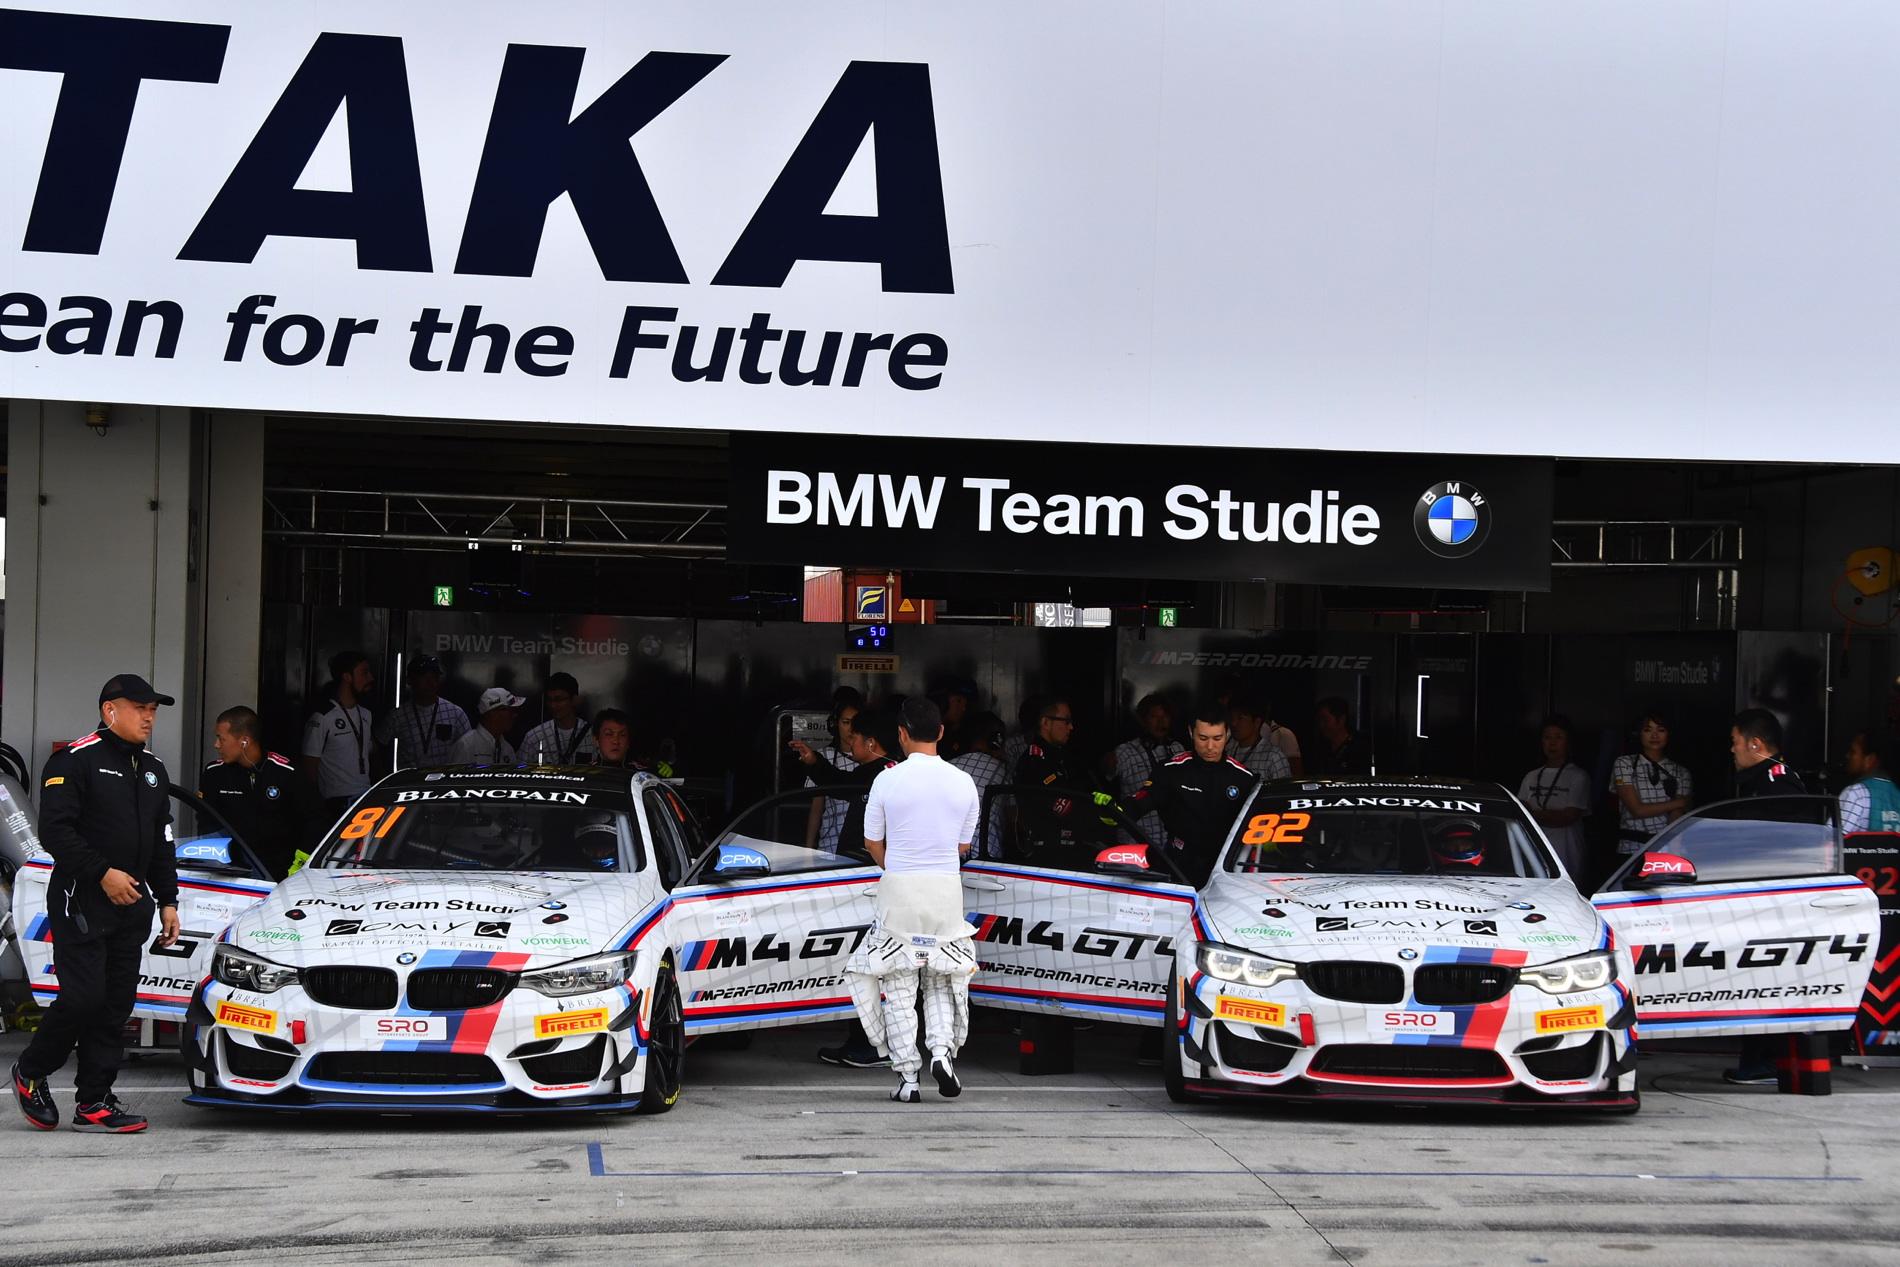 BMW Team Studie M4 GT4 01